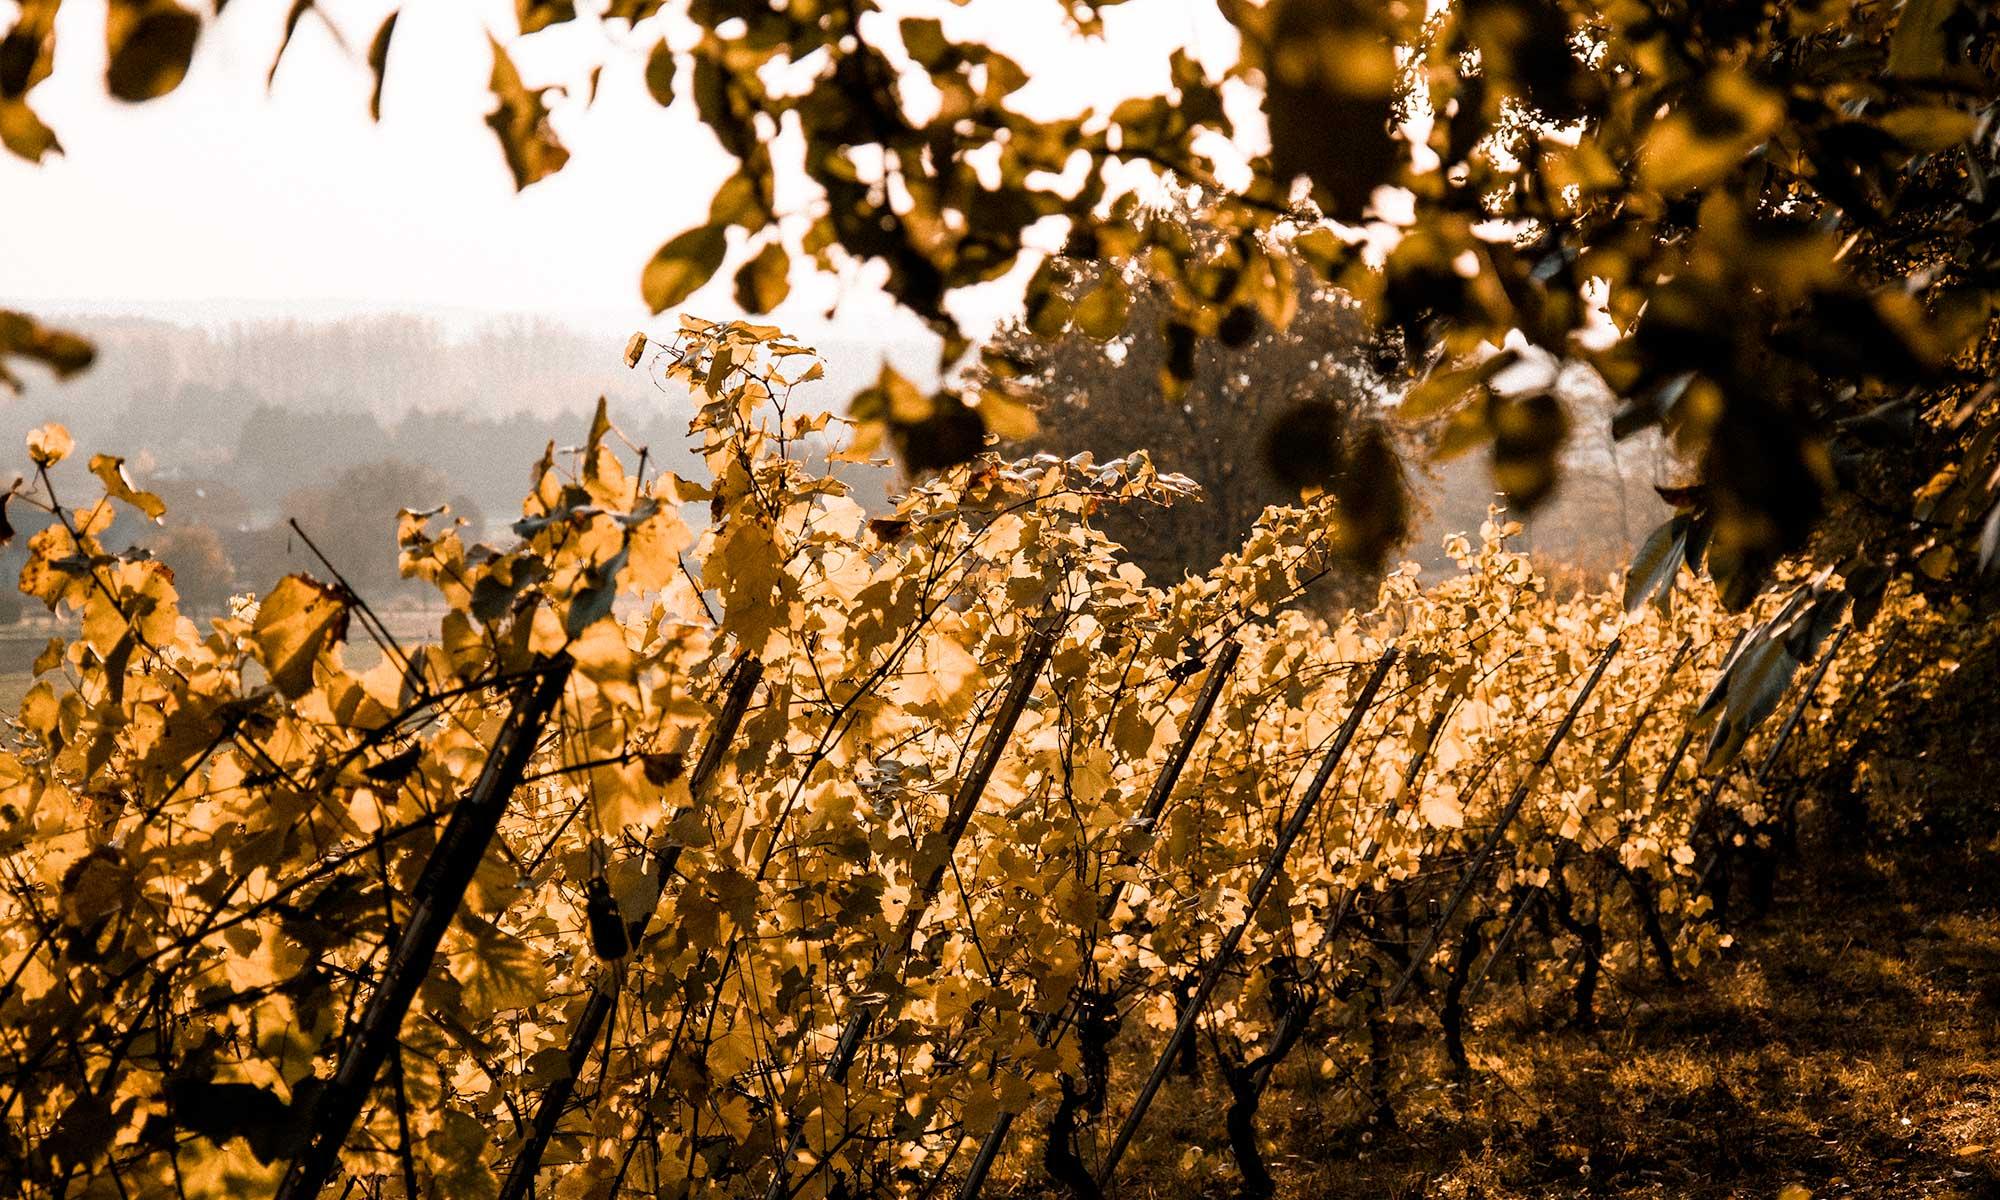 Walking along the vineyards near the tiny house Belgium